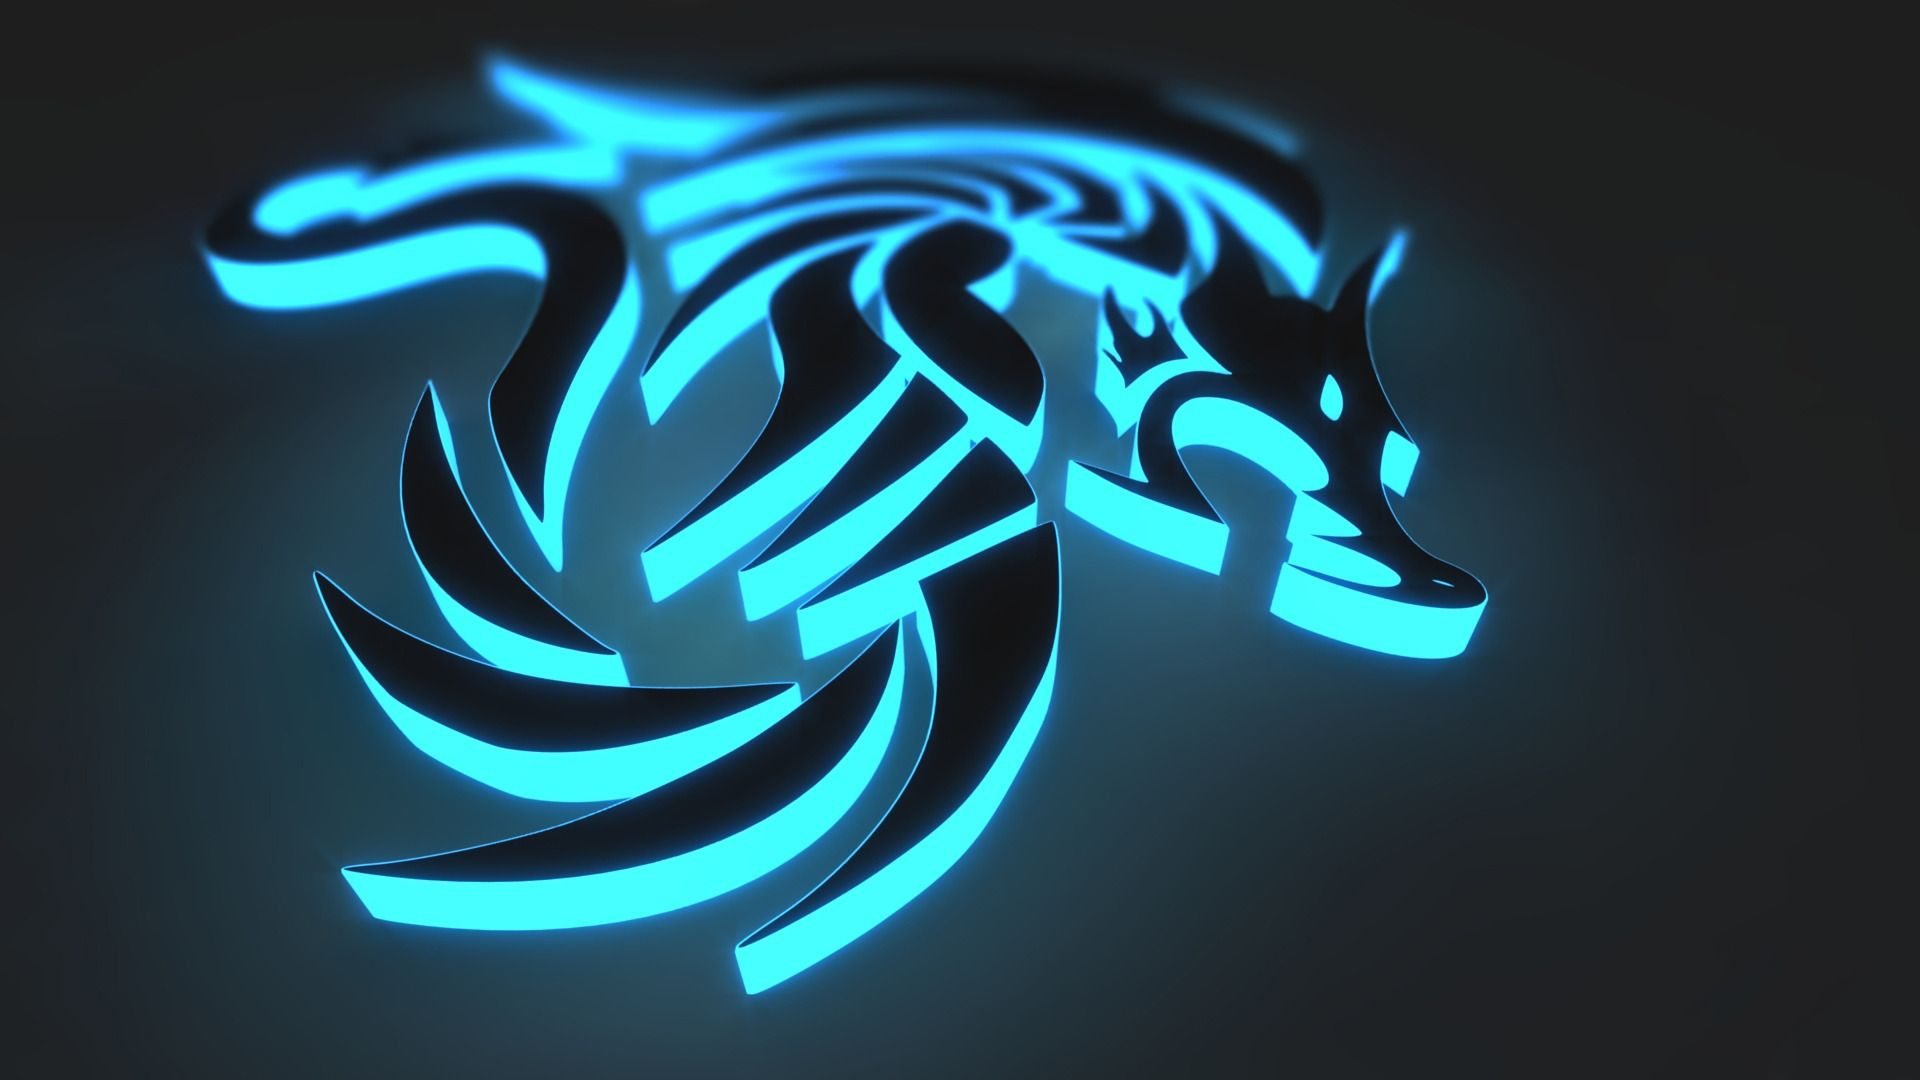 Dragon HD Wallpapers 1080p Group (84+)